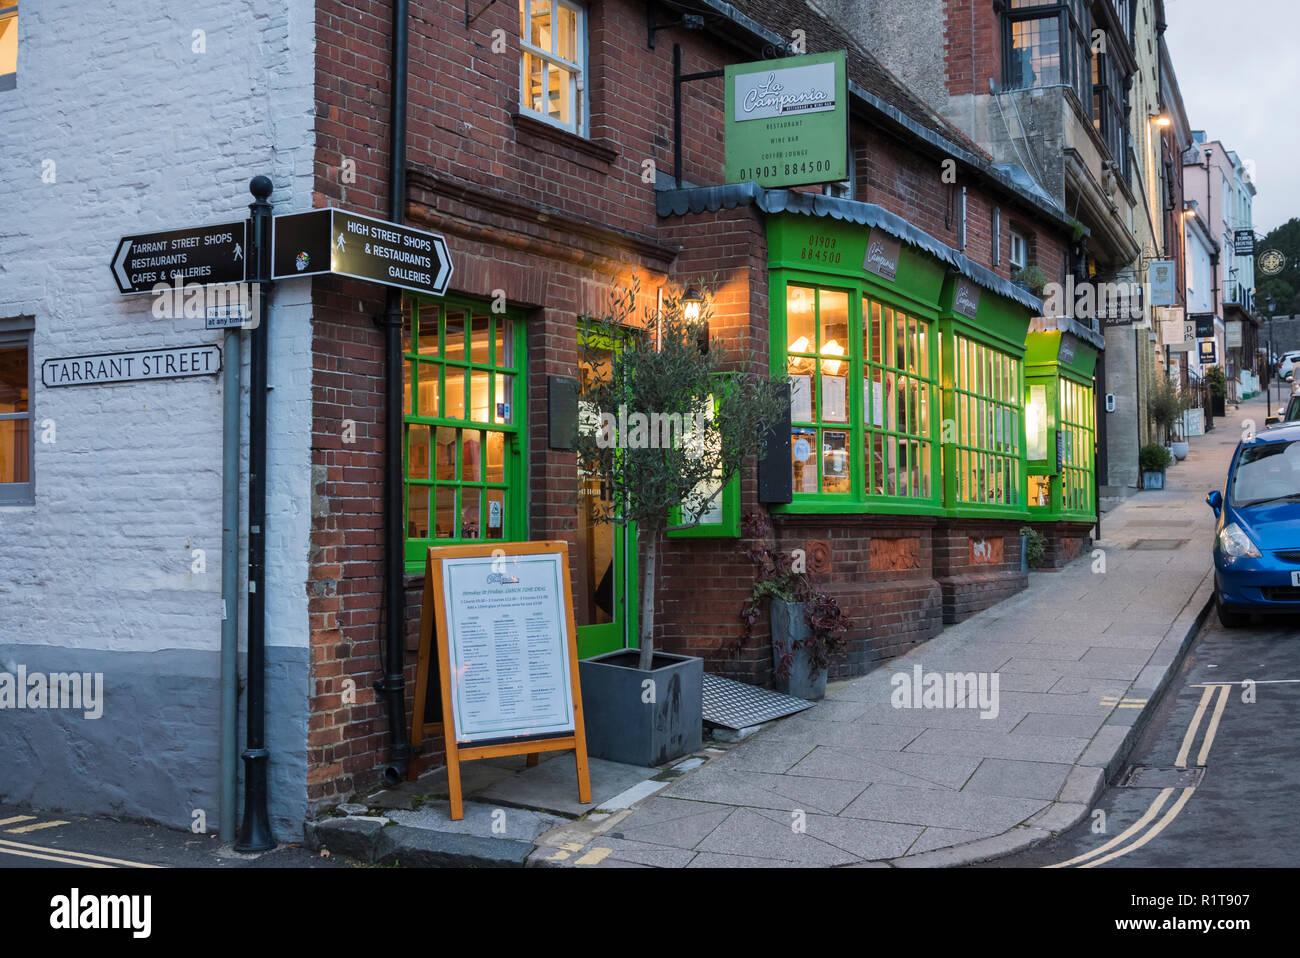 La Campania Restaurant & Wine Bar in Arundel, West Sussex, England, UK. - Stock Image